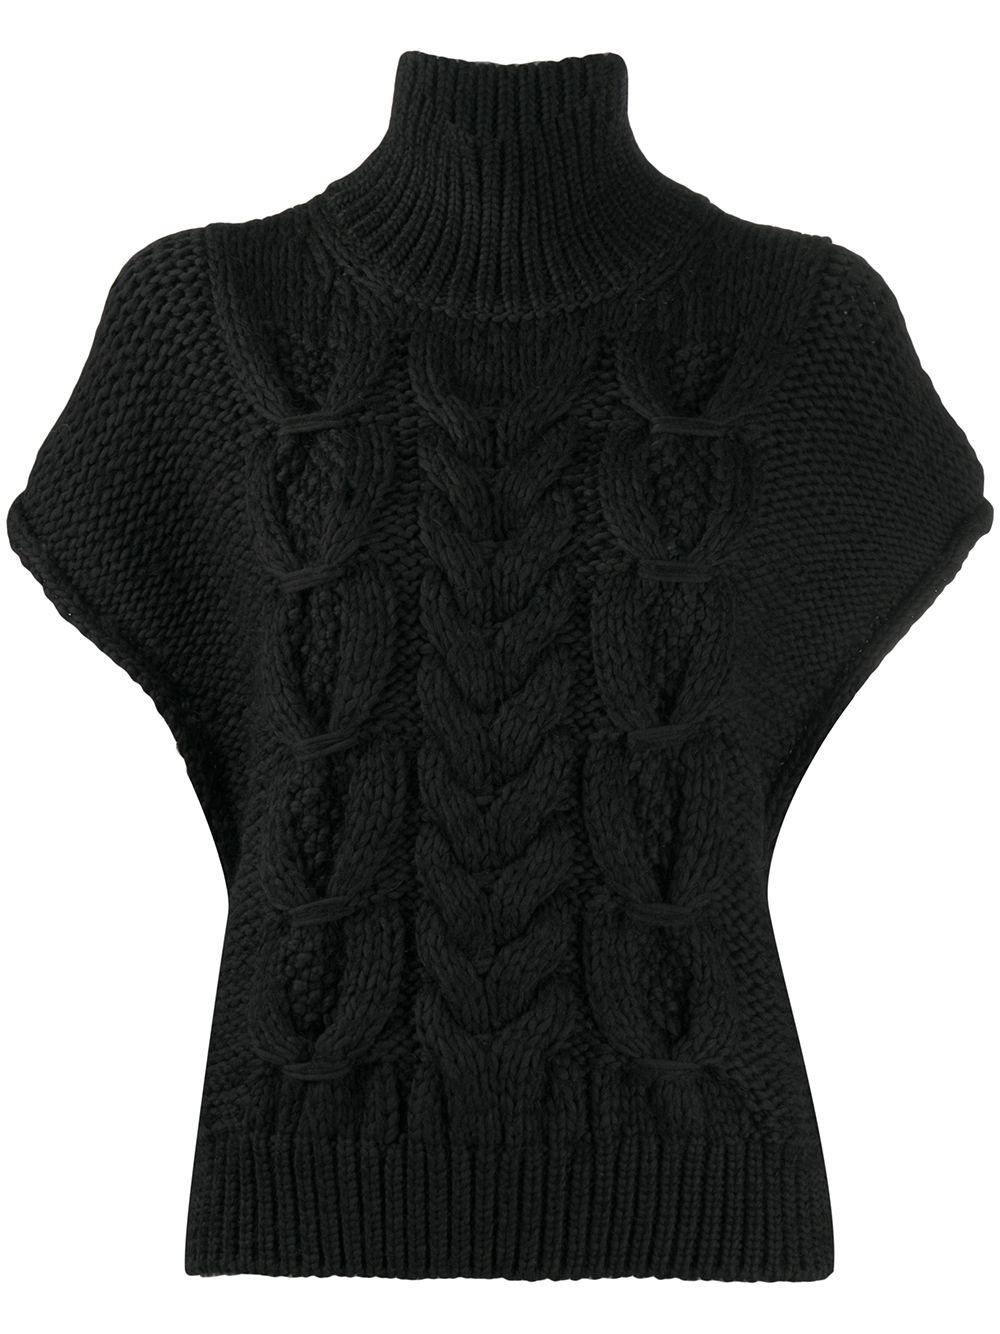 Interwoven Waistcoat